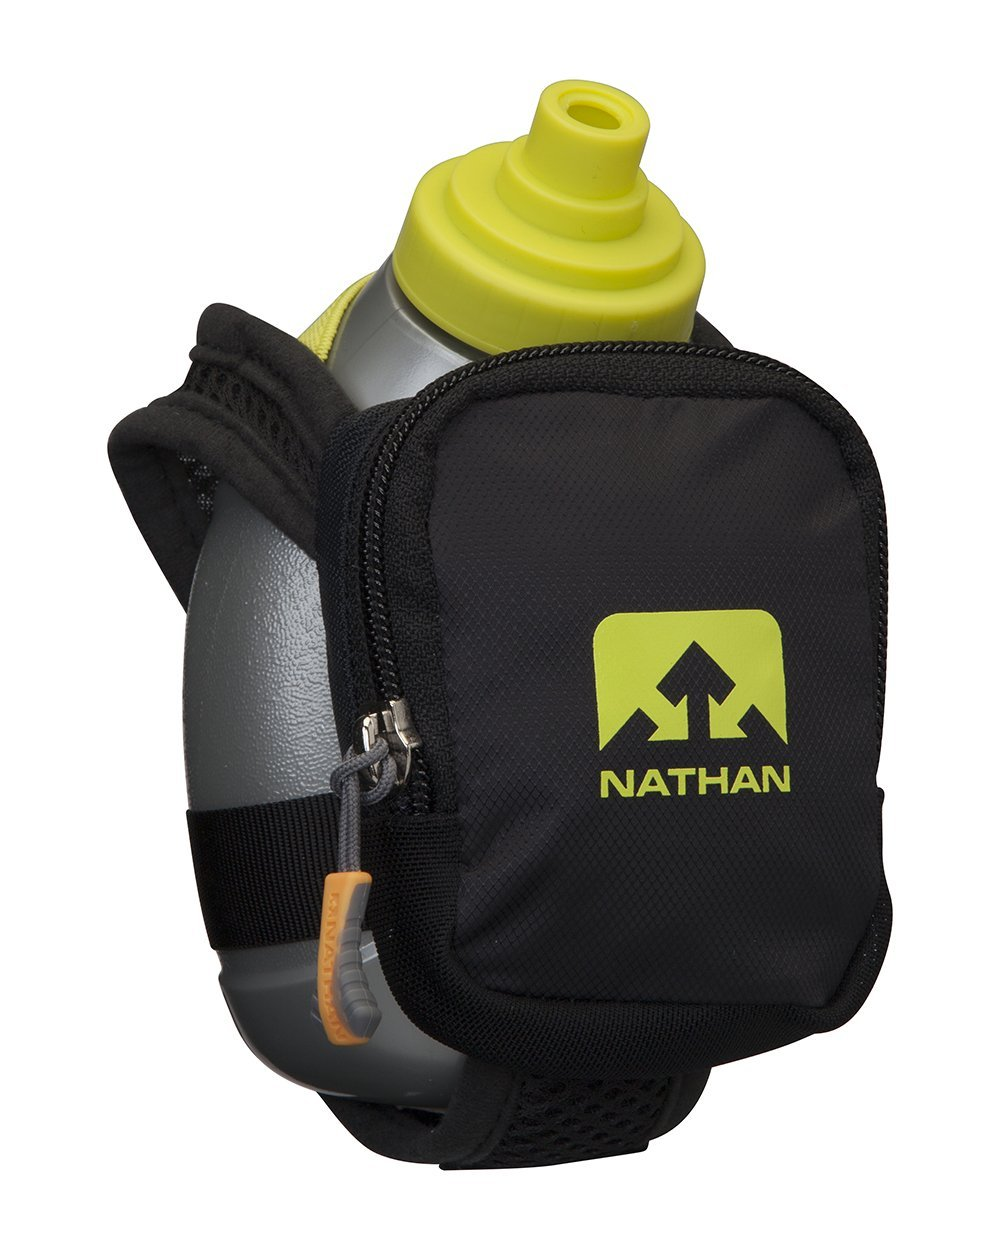 Nathan Quick Shot Plus Handheld Hydration Pack, Black